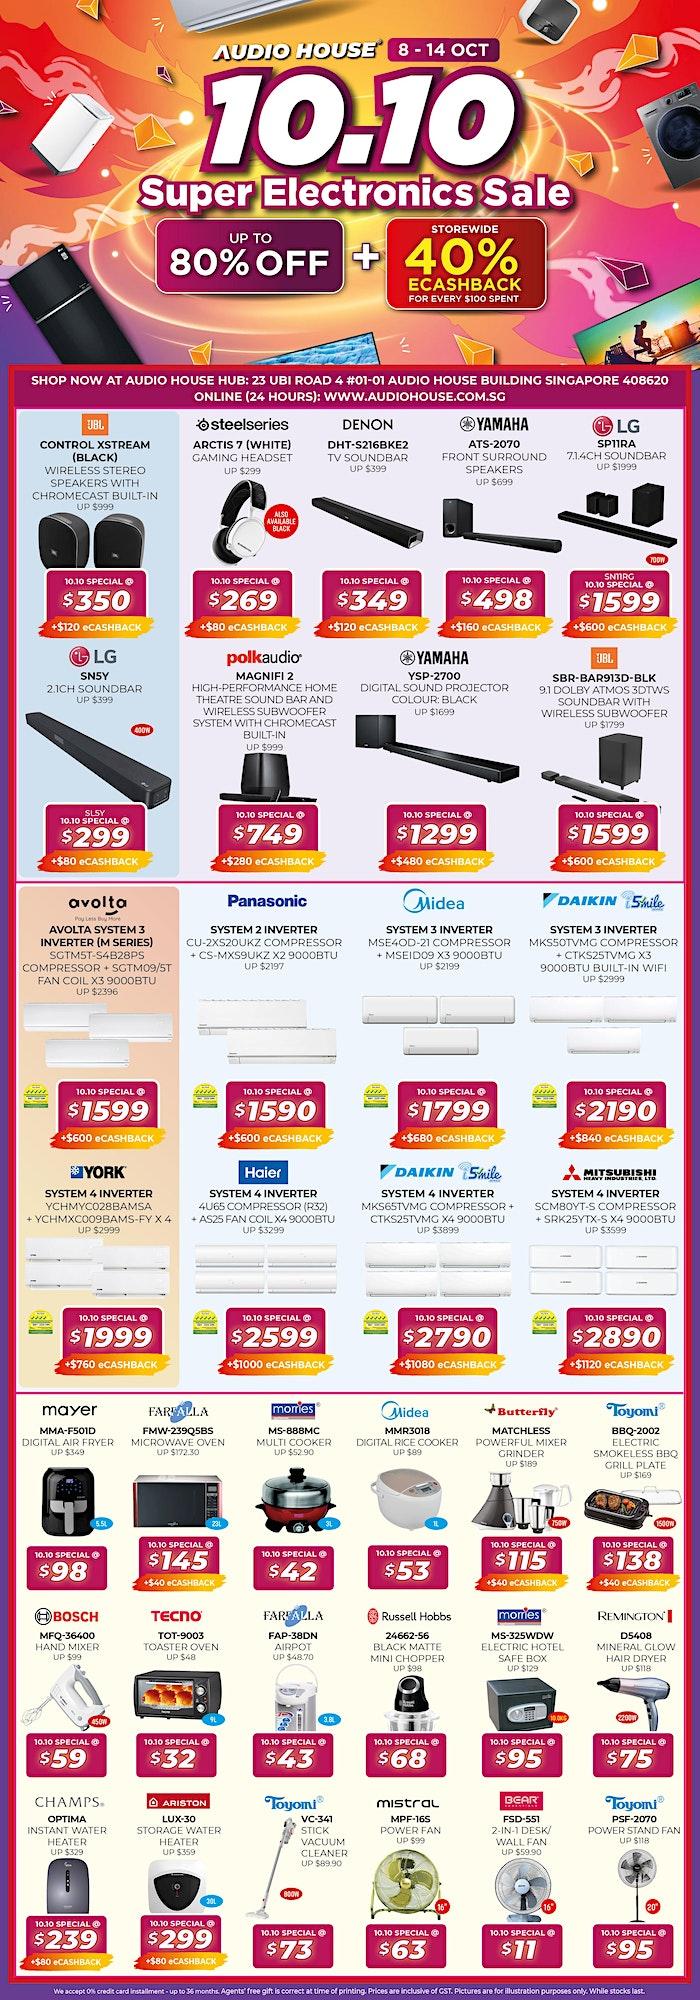 Audio House 10.10 Super Electronics Sale image